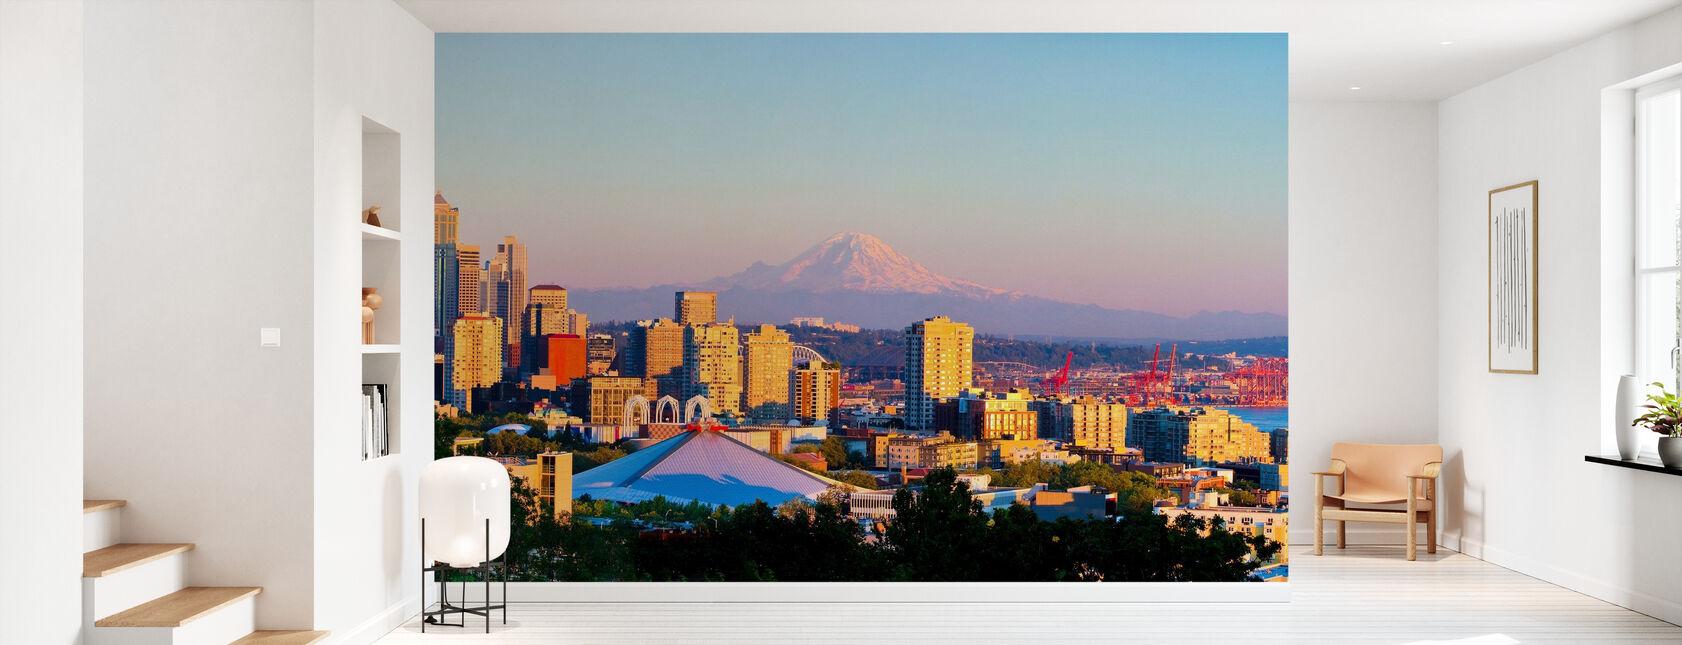 Seattle and Mount Rainier - Wallpaper - Hallway